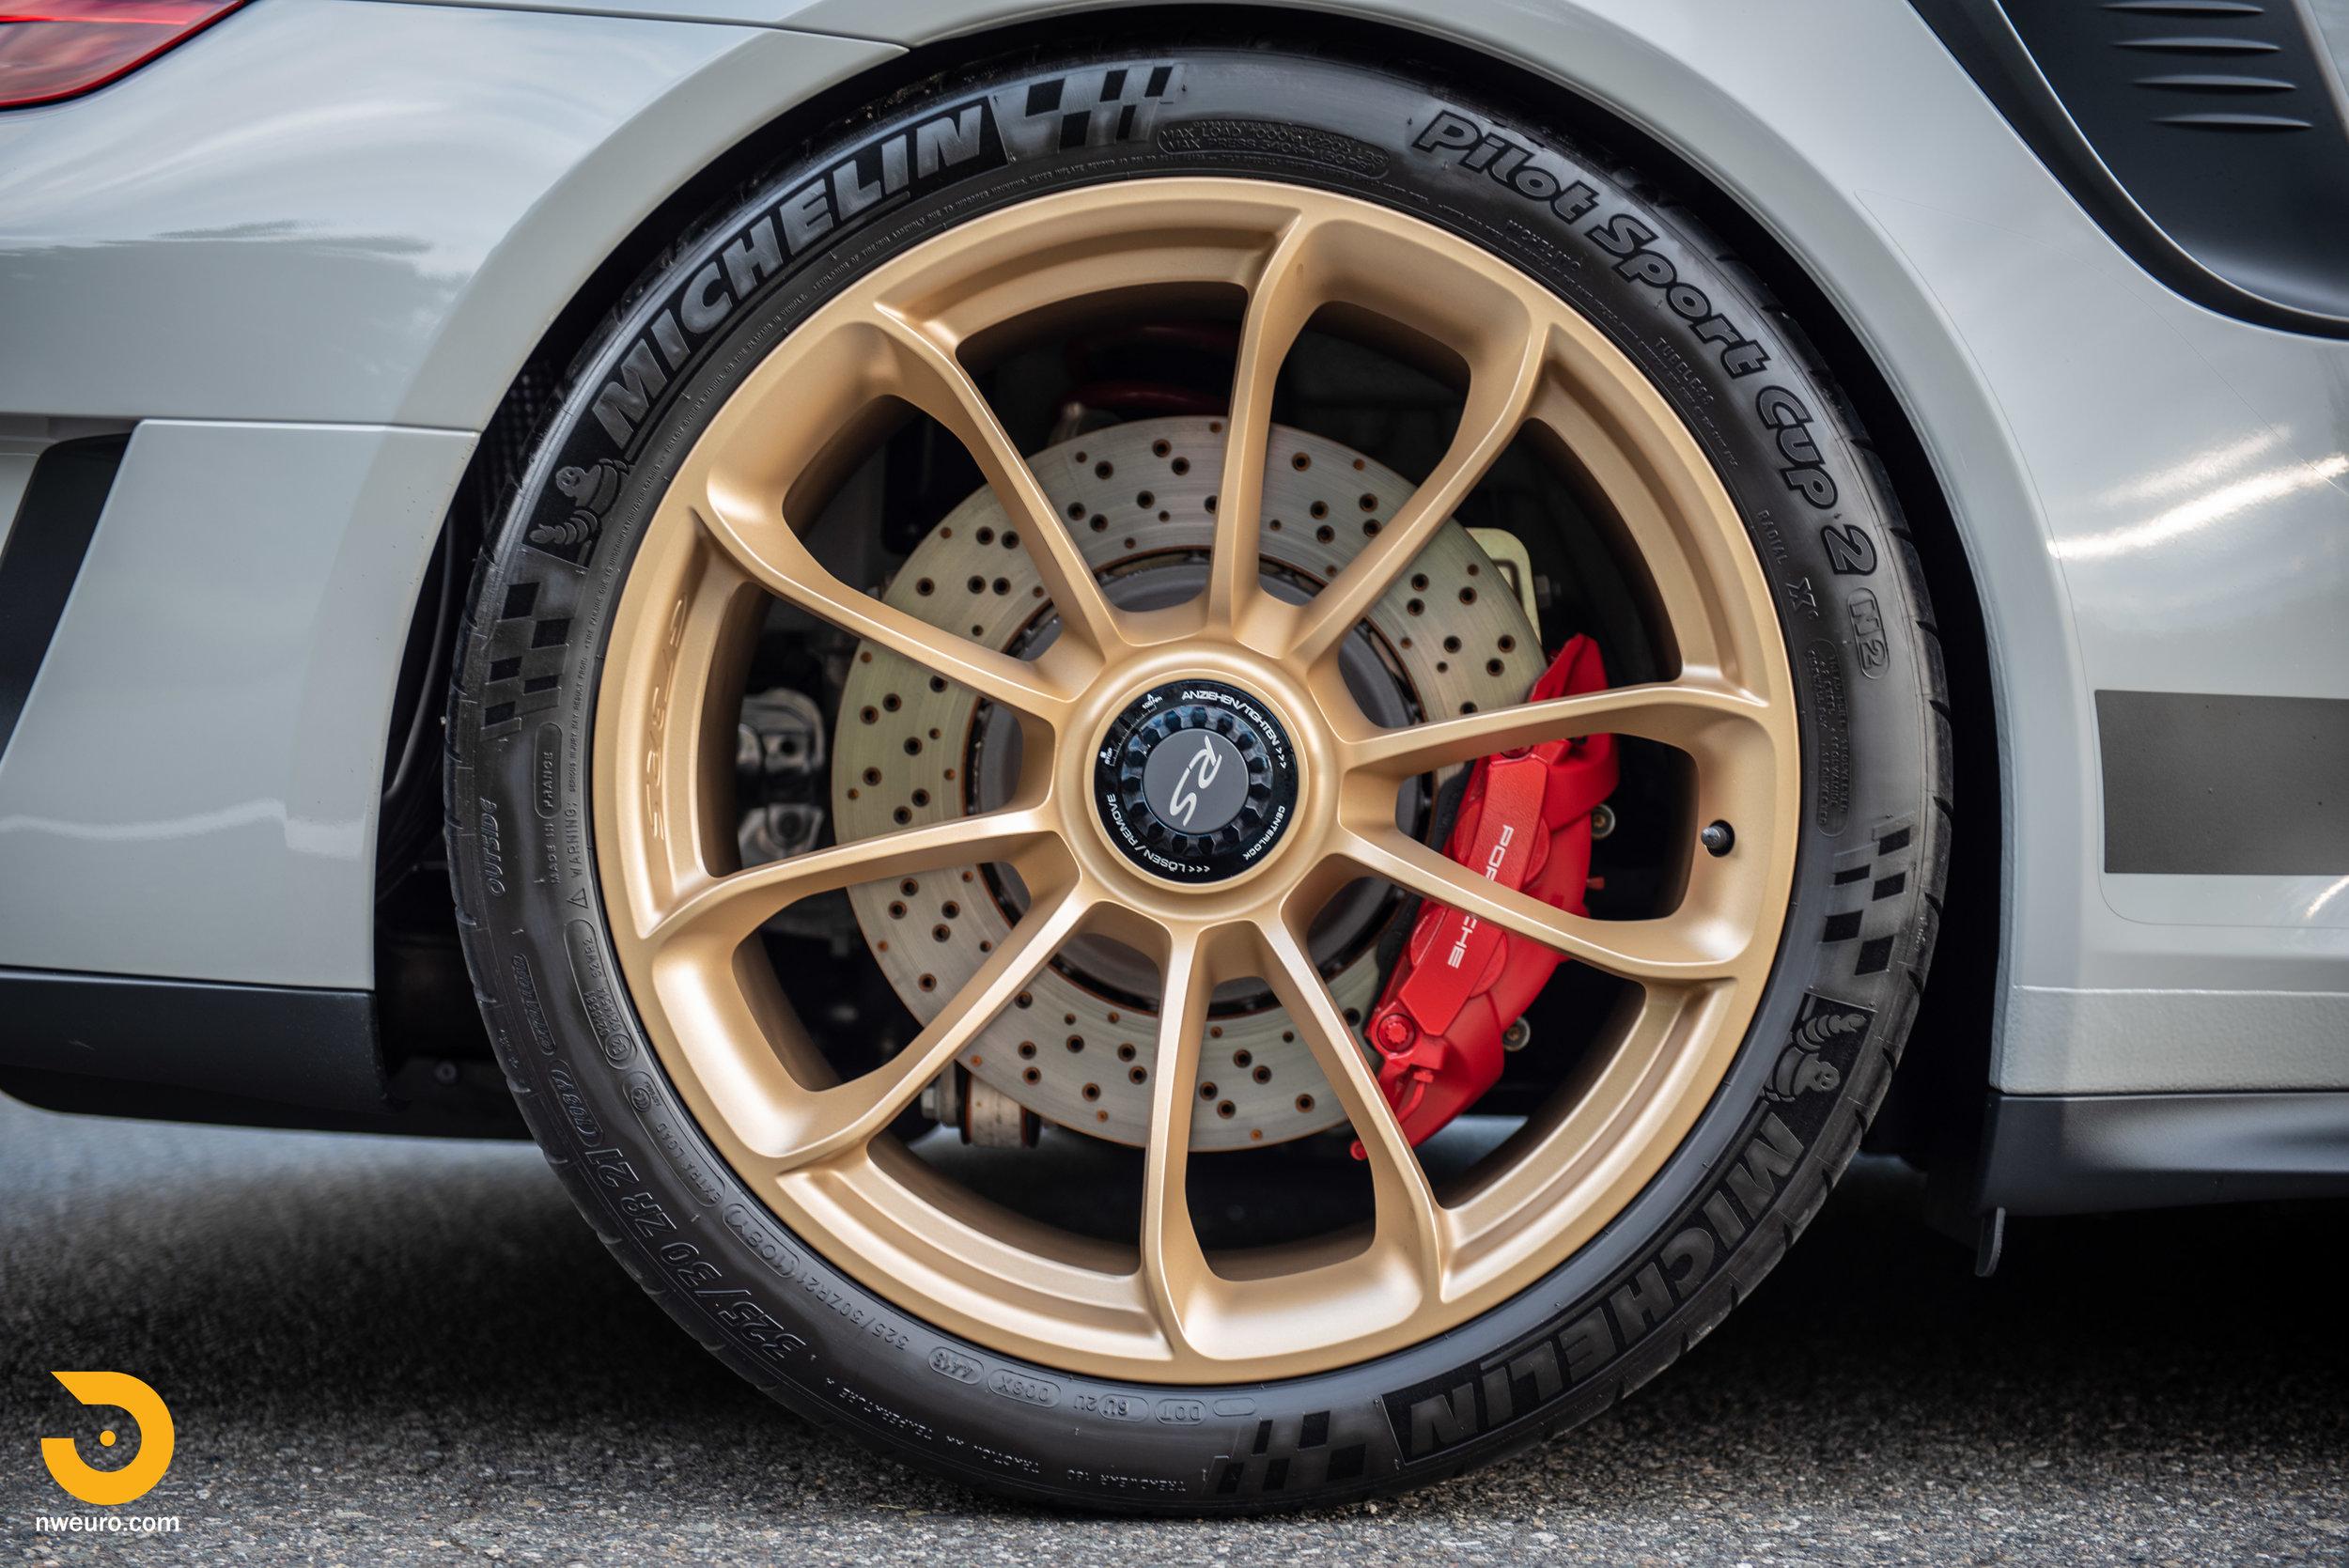 2019 Porsche GT3 RS - Chalk-62.jpg